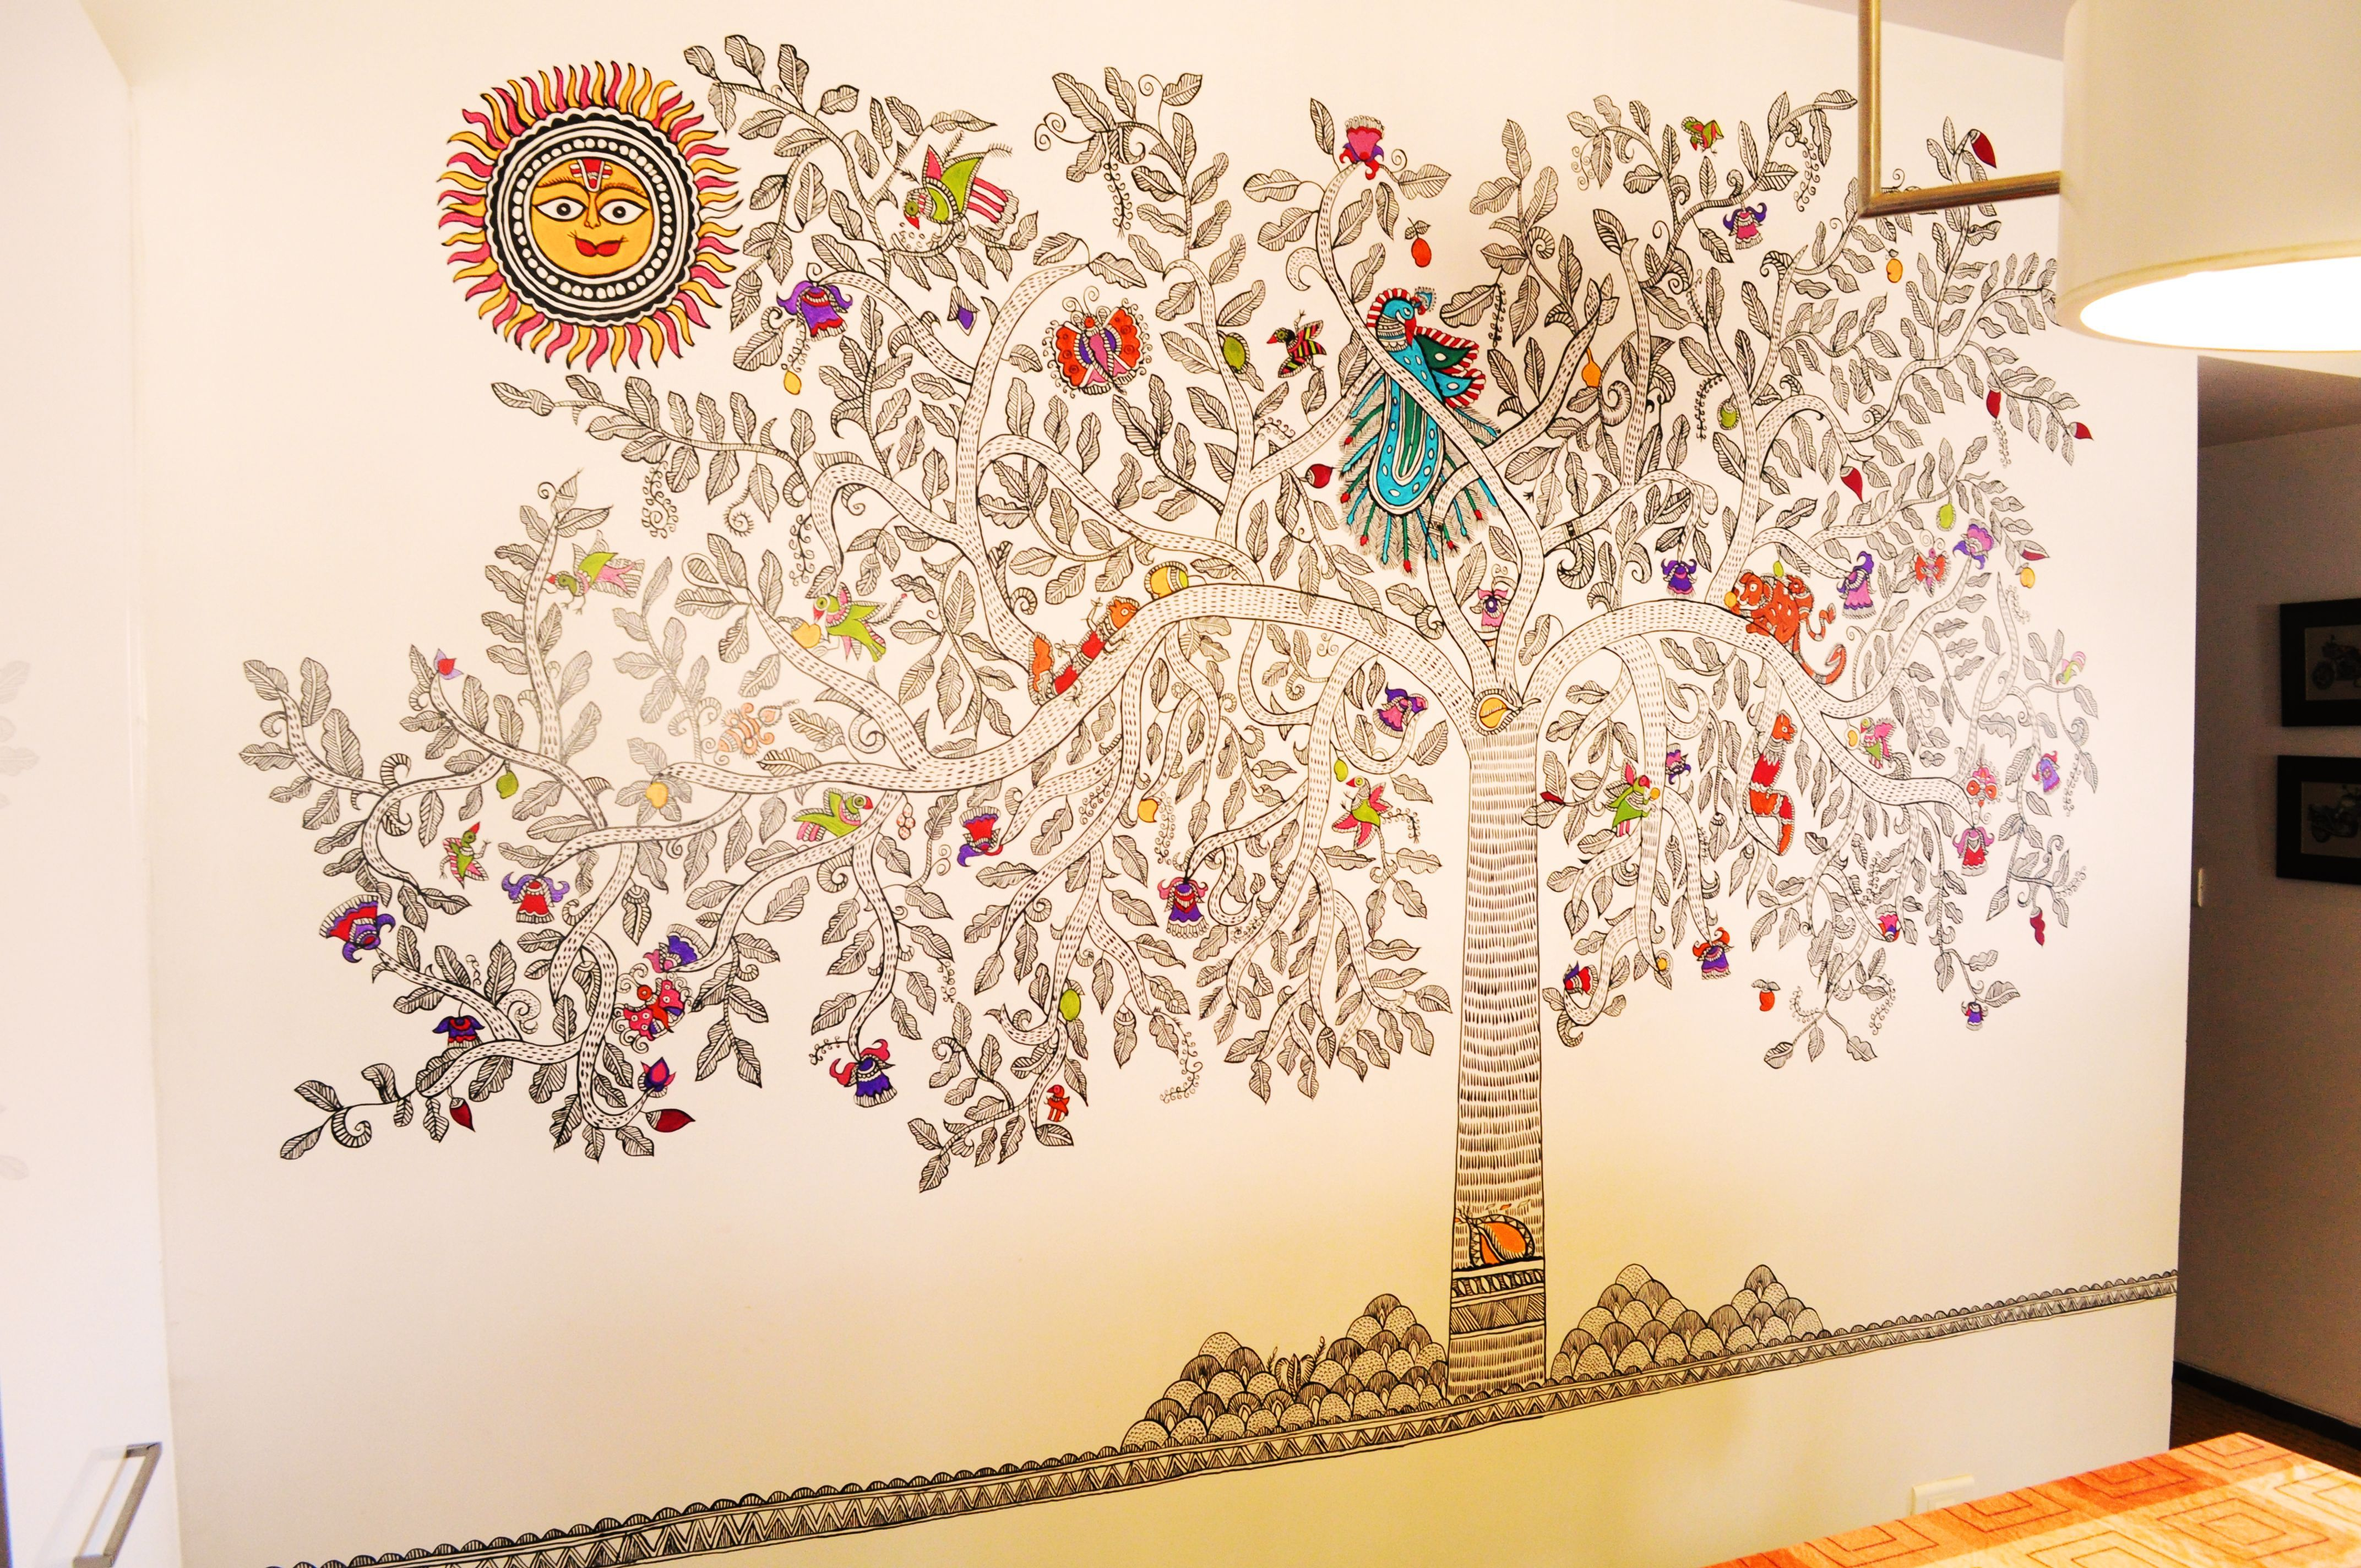 Madhubani wall mural surat gujarat craftcanvas wall art madhubani wall mural surat gujarat craftcanvas amipublicfo Gallery